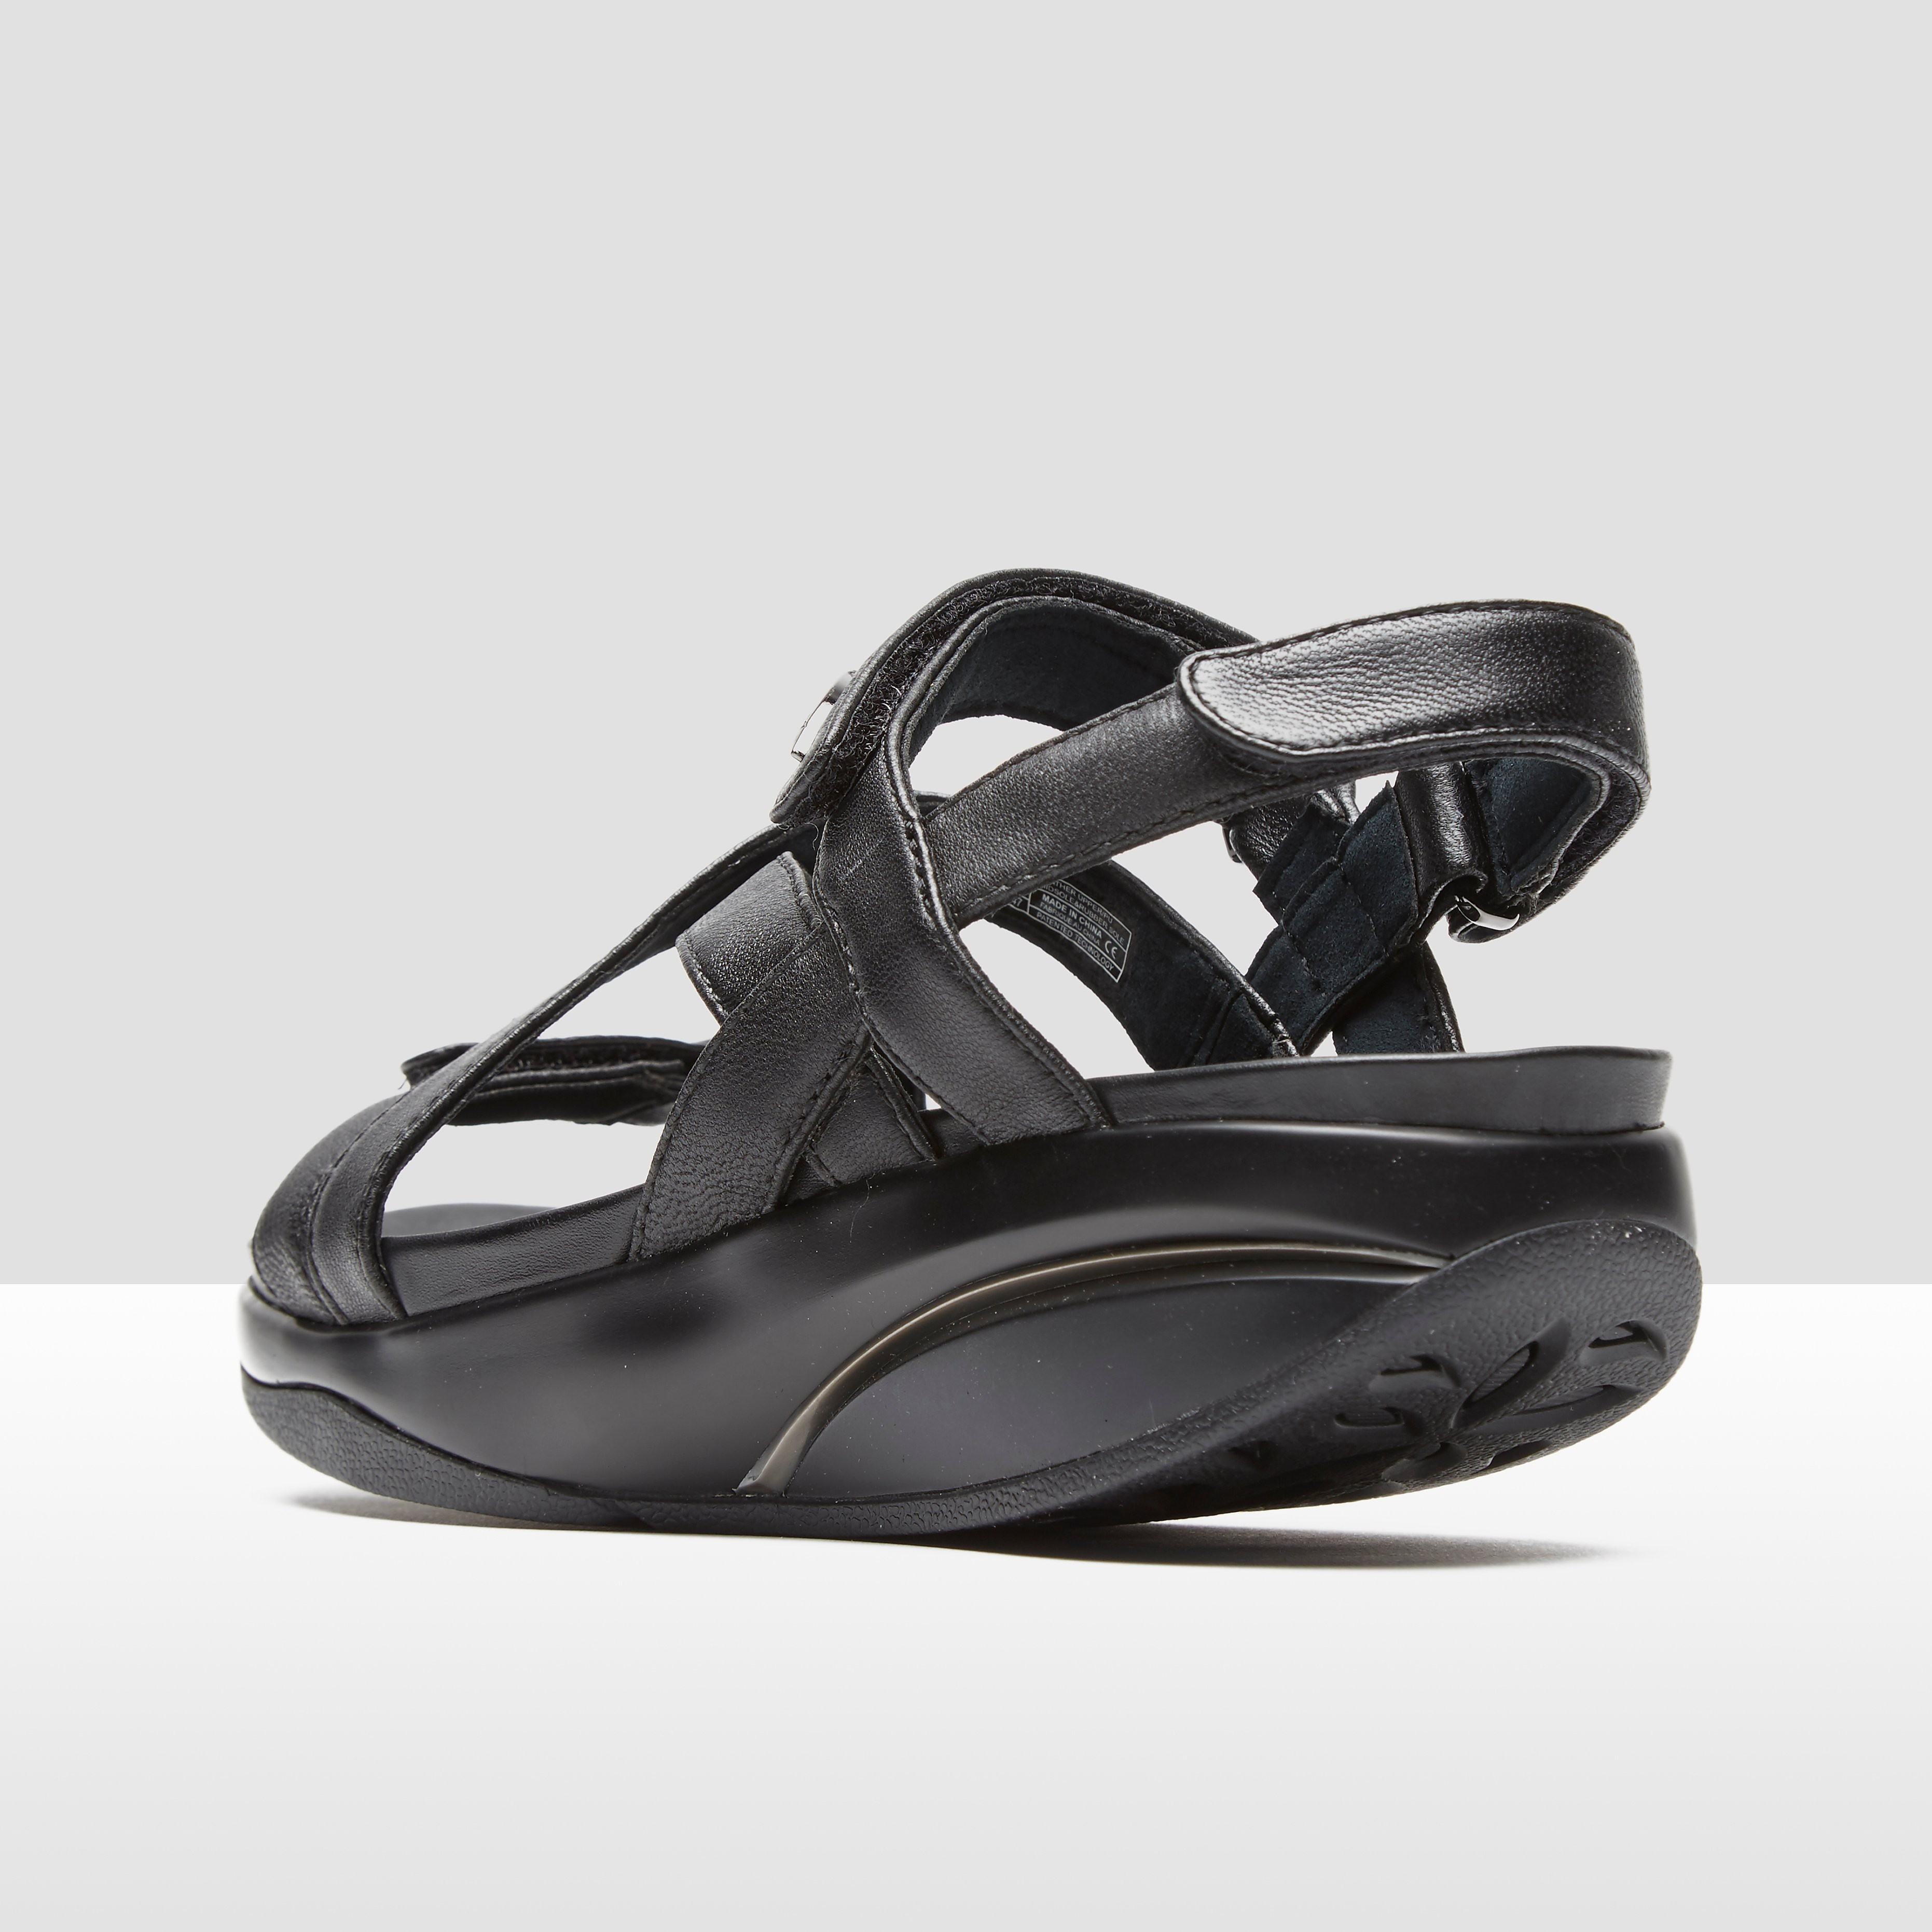 MBT Kiburi Women's Sandals